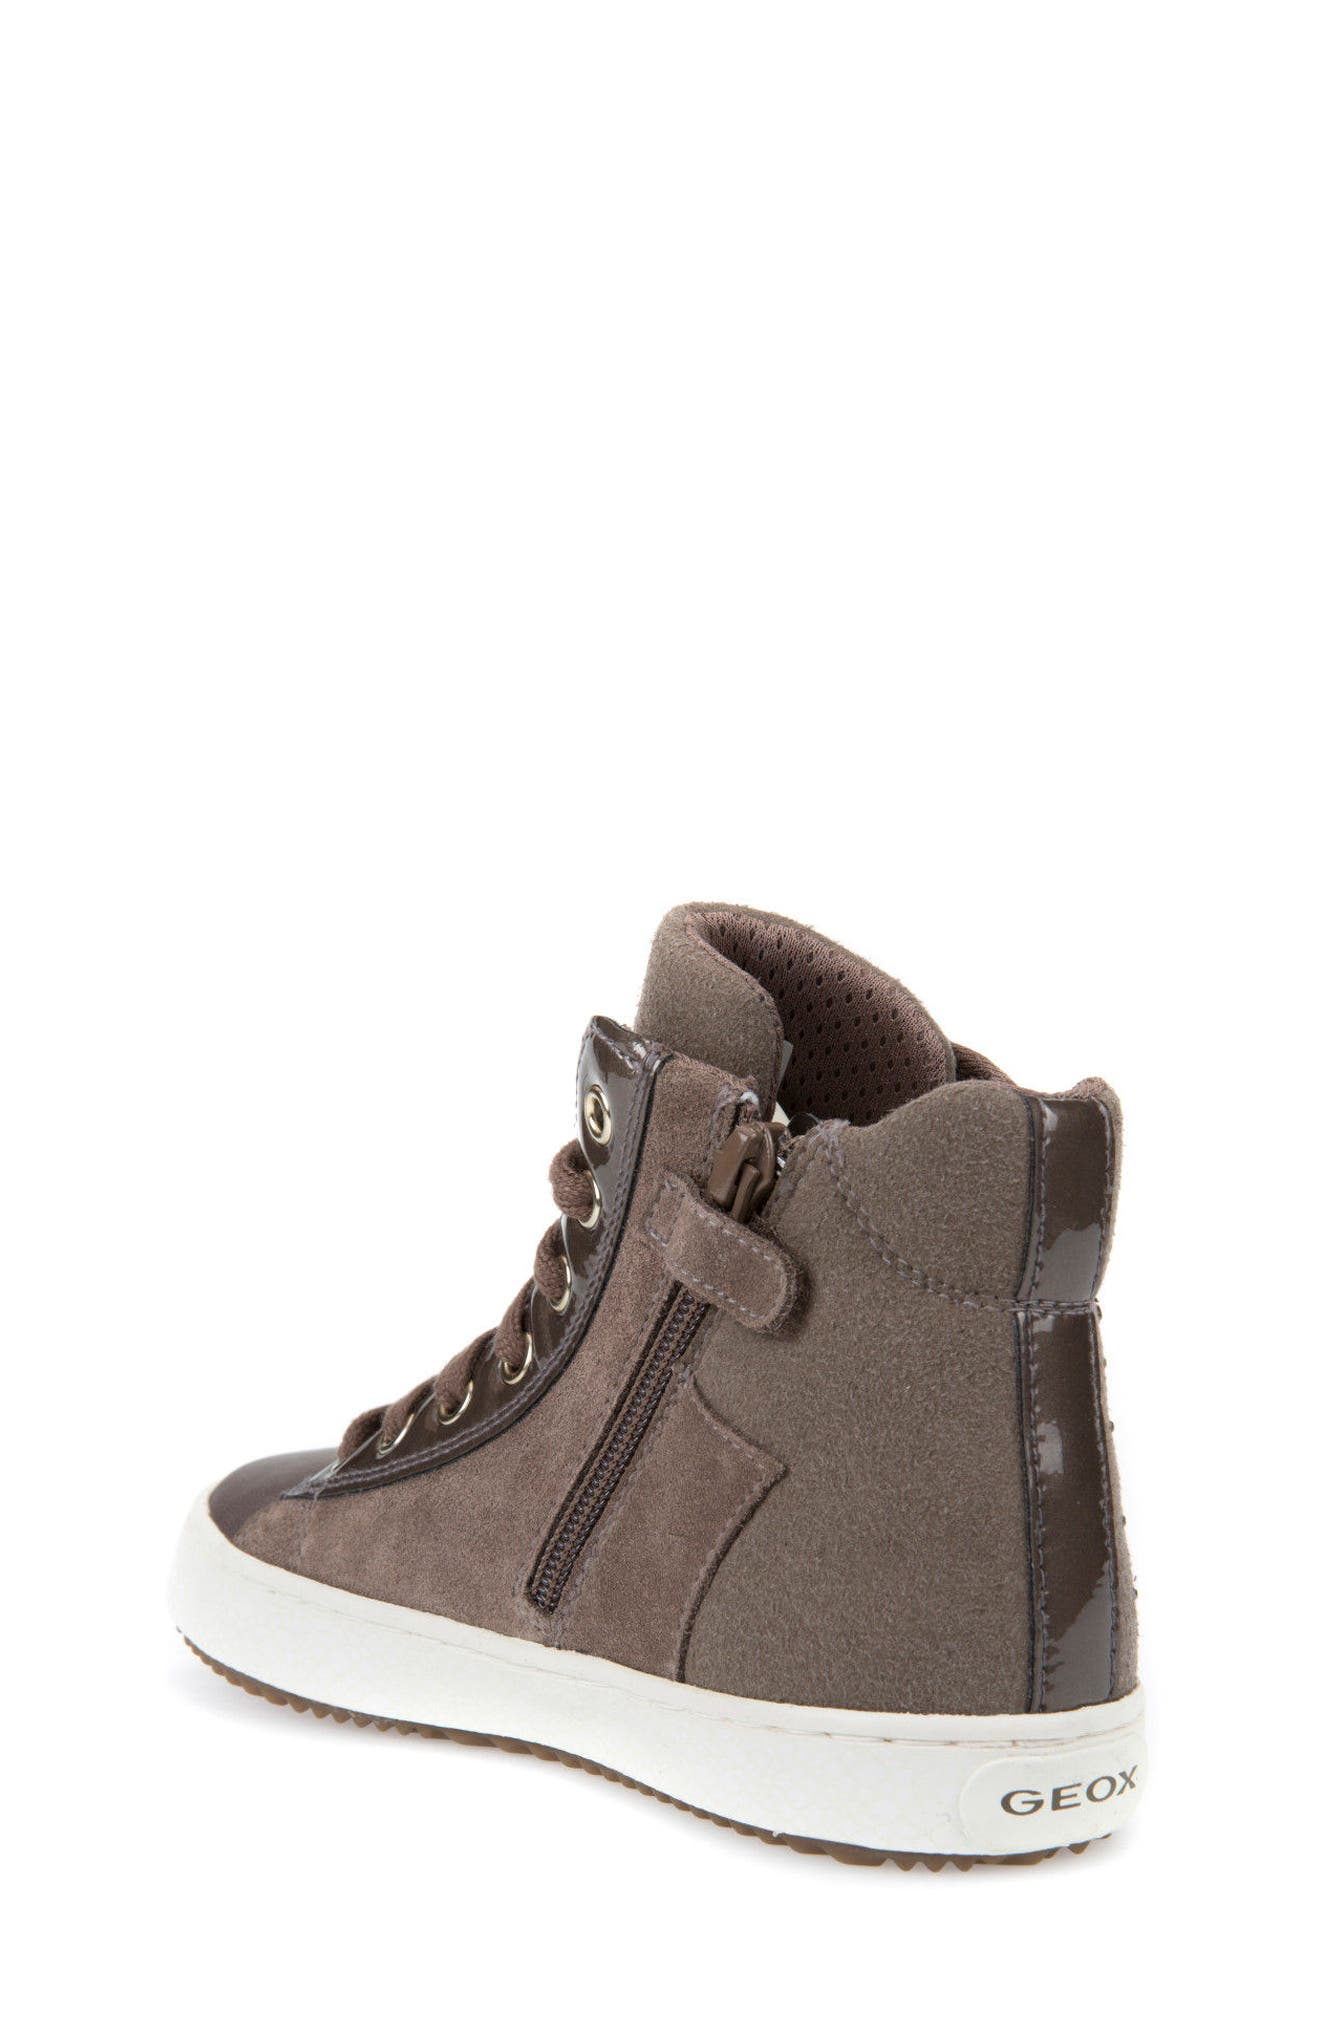 Kalispera Girl Embellished High Top Sneaker,                             Alternate thumbnail 3, color,                             Dark Beige